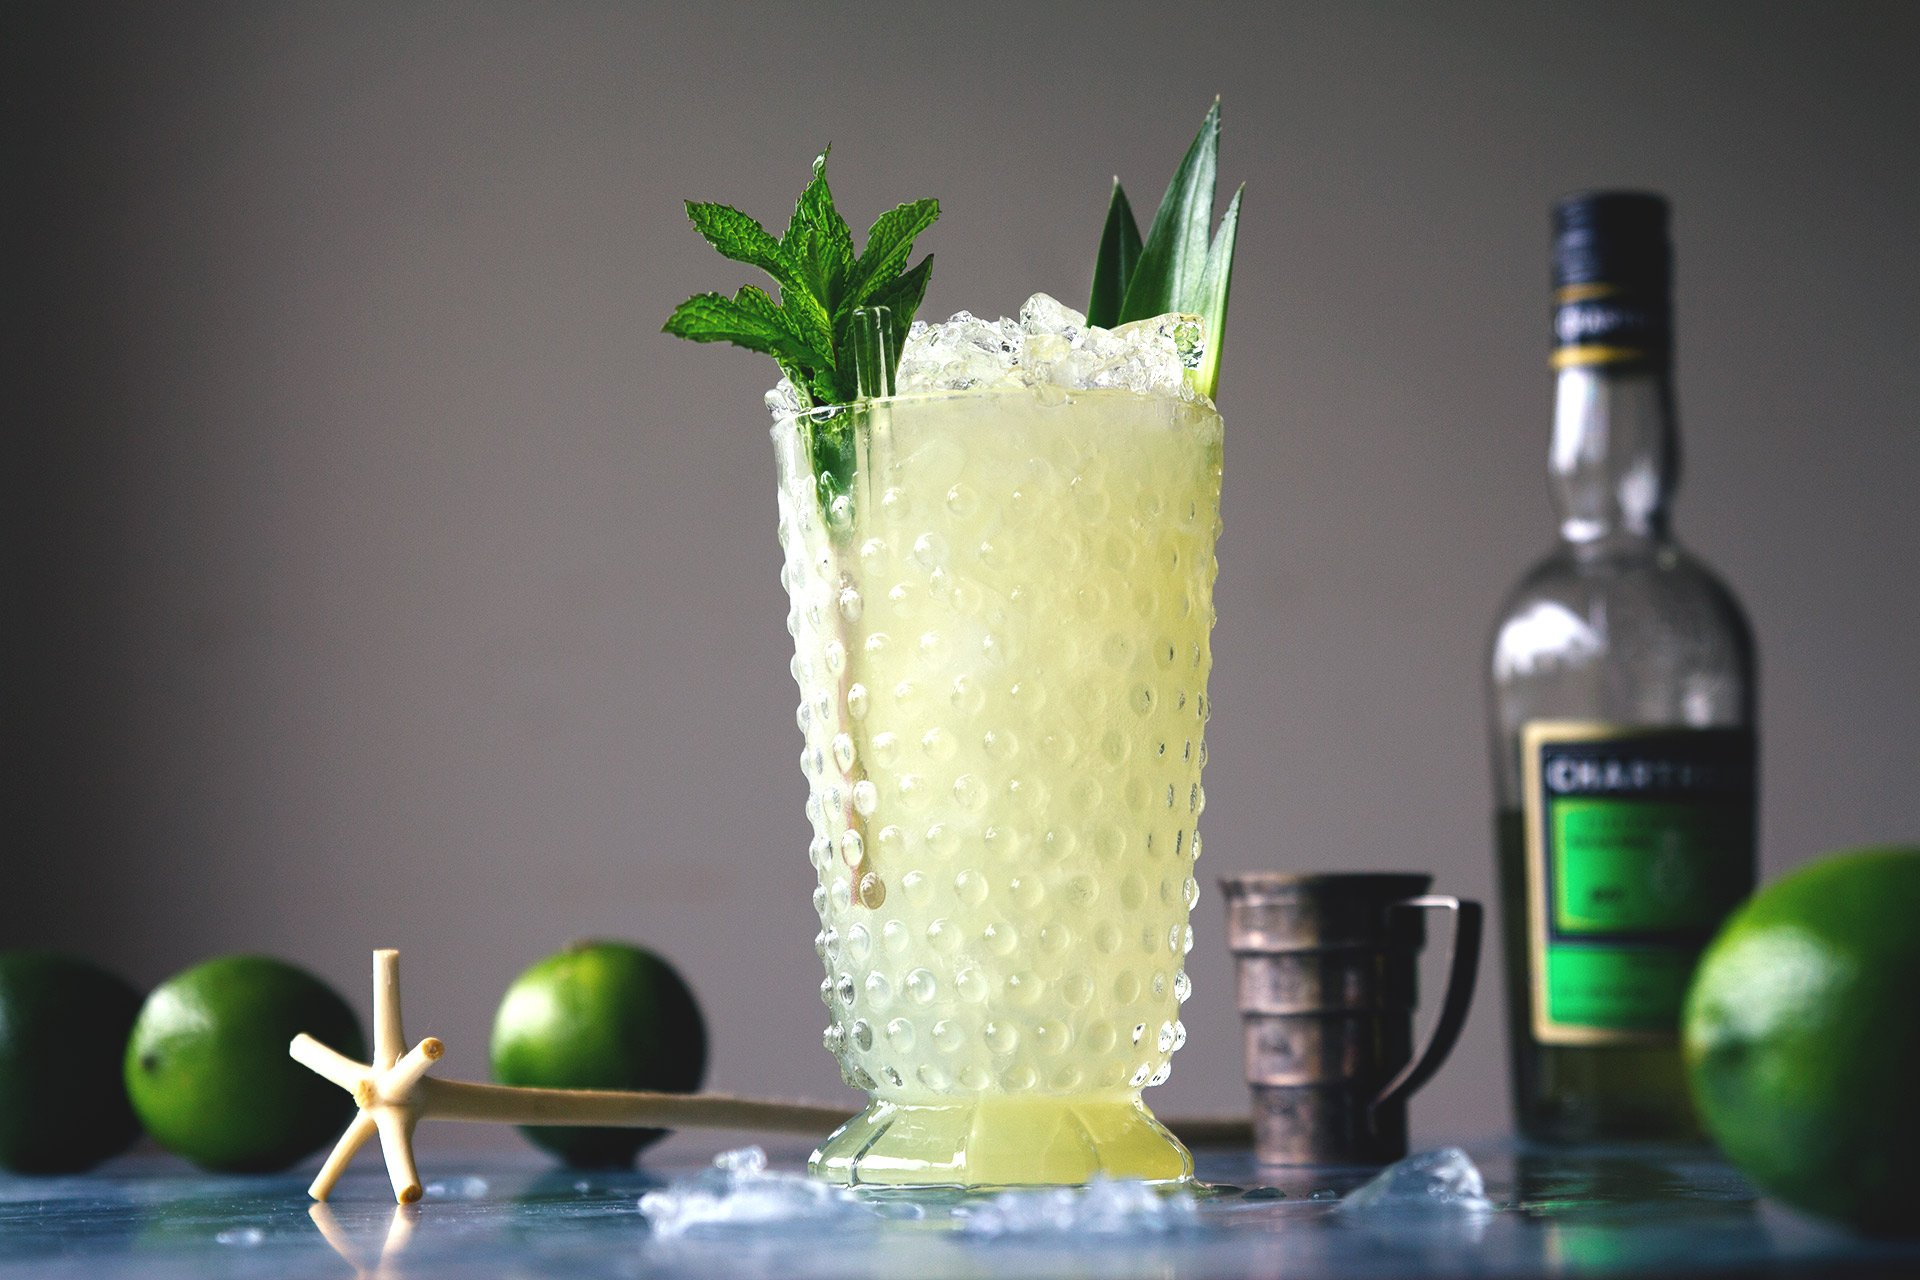 Chartreuse Swizzle | HonestlyYUM (honestlyyum.com)